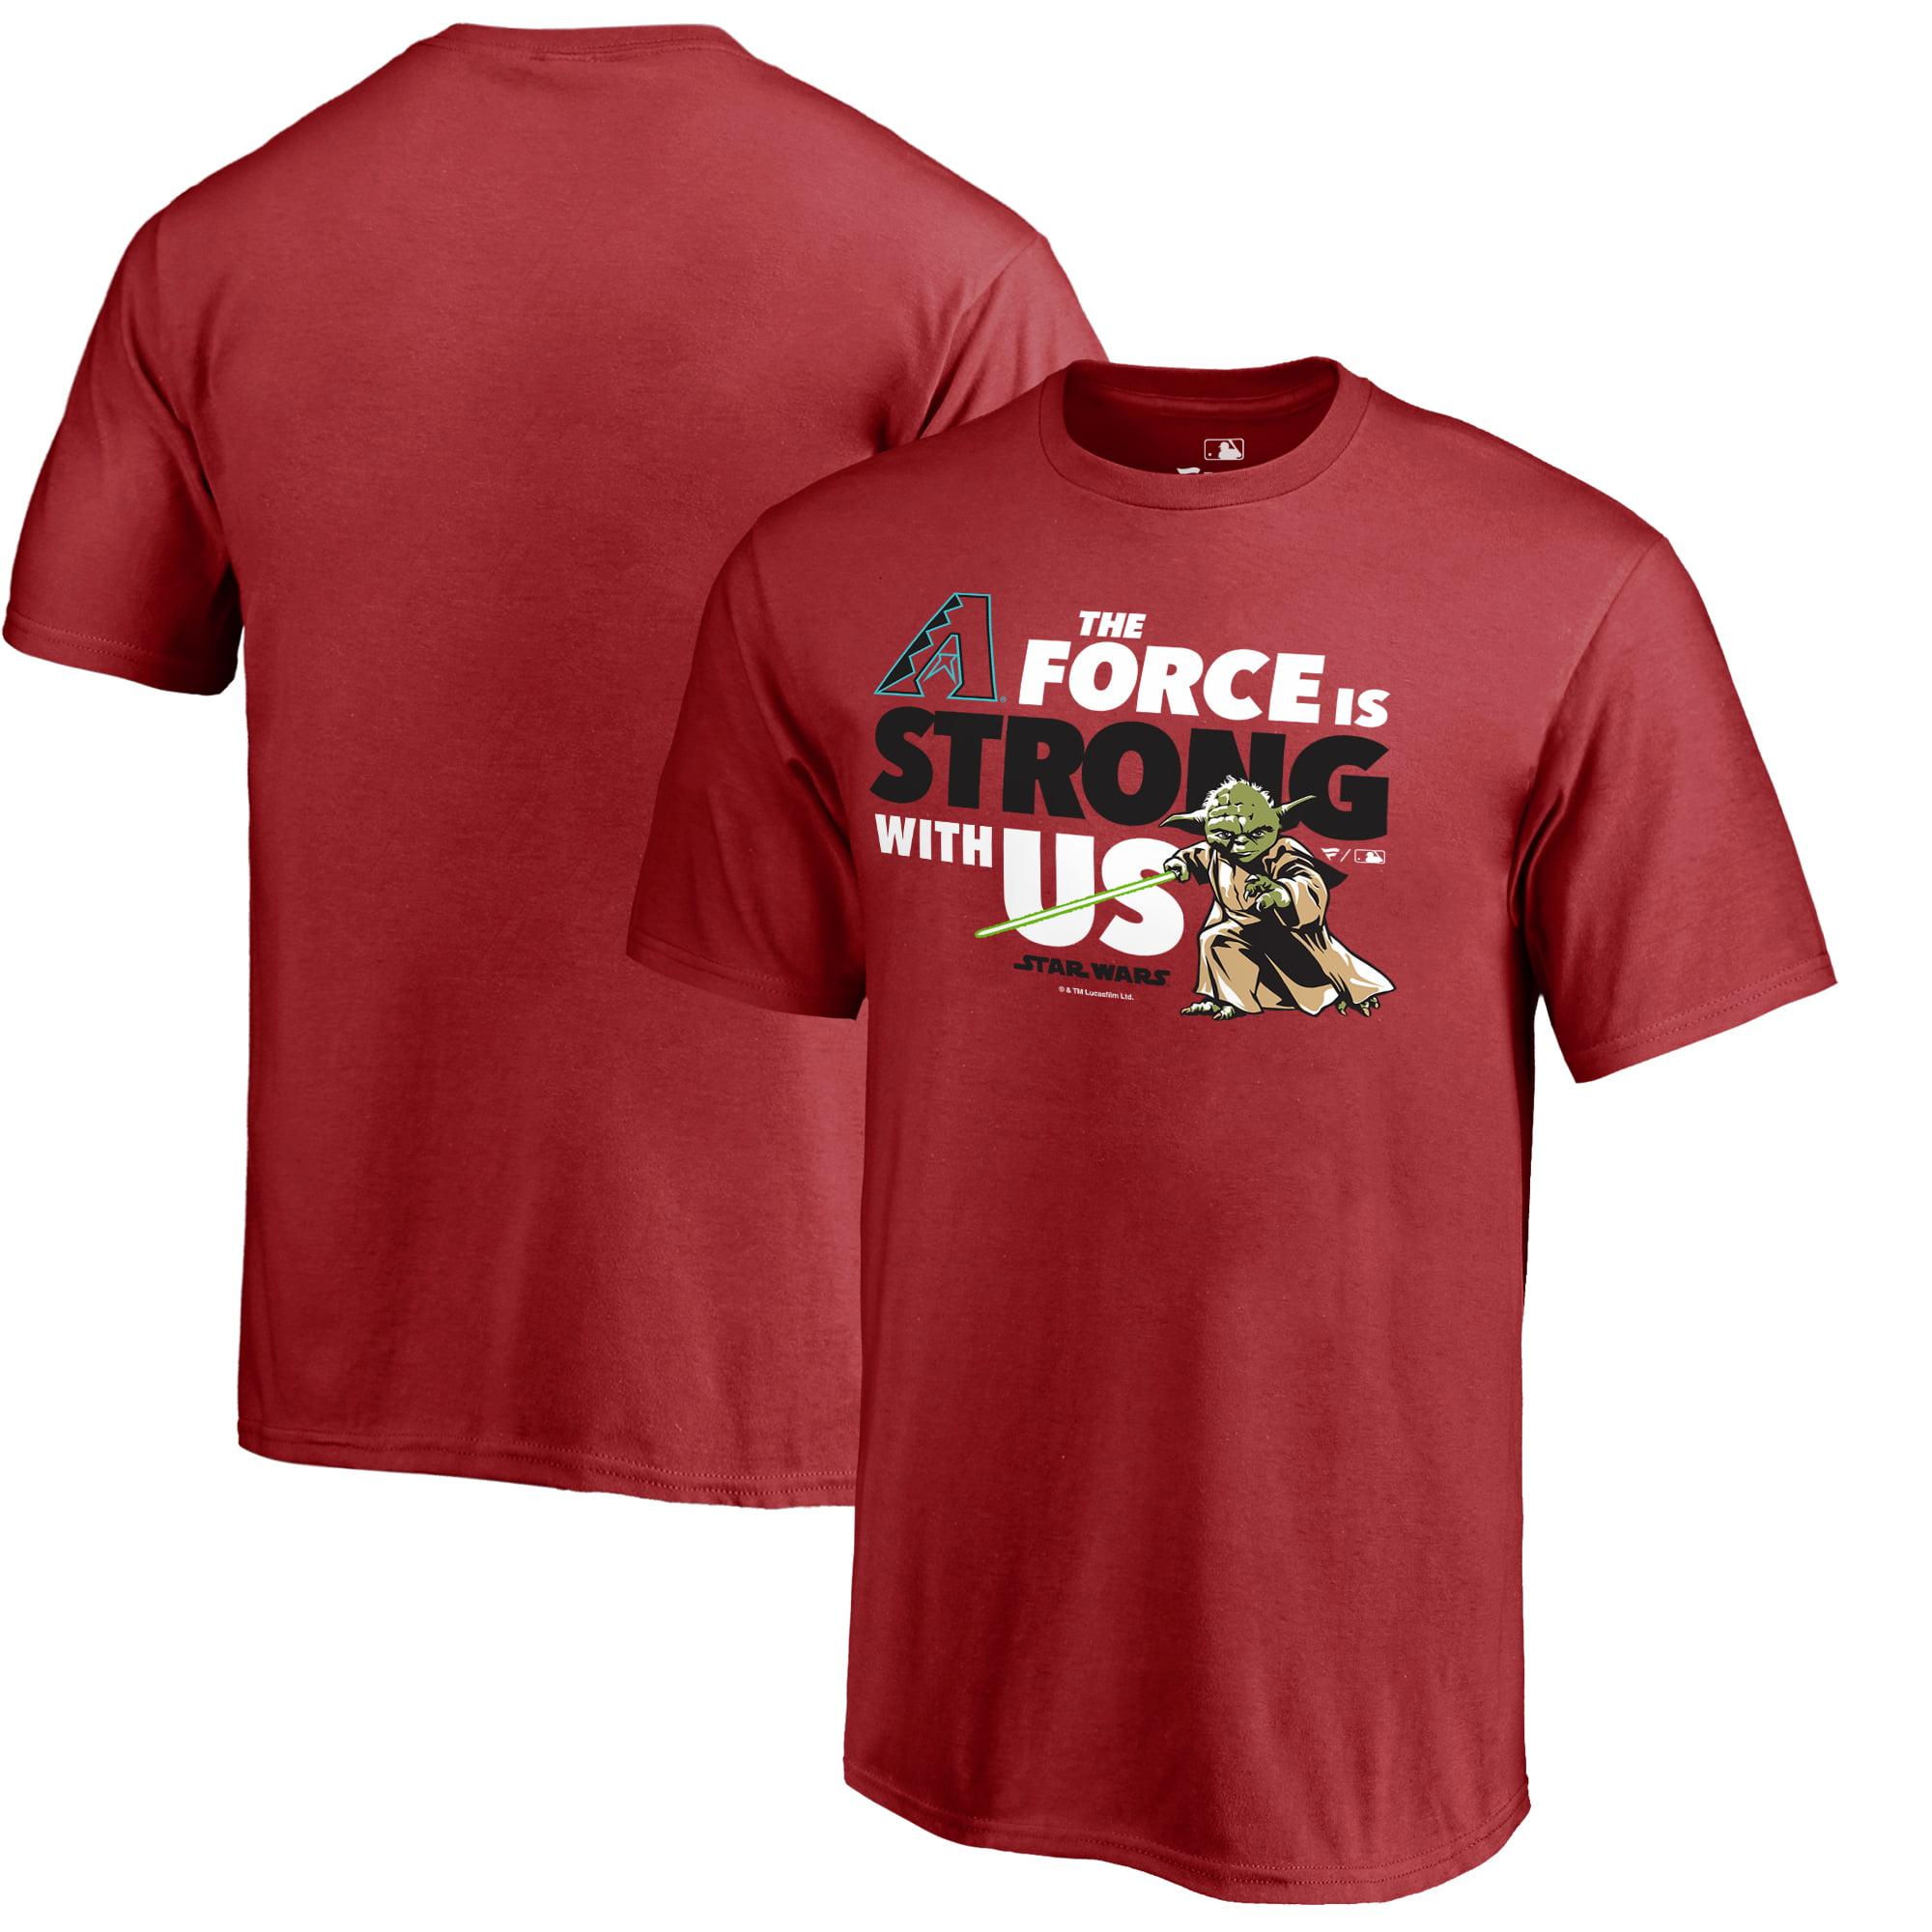 Arizona Diamondbacks Fanatics Branded Youth Star Wars Jedi Strong T-Shirt - Red